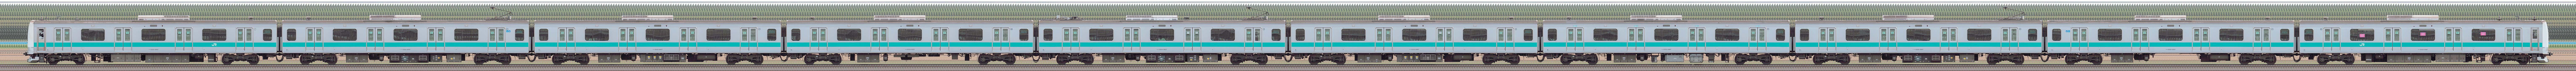 JR東日本 常磐緩行線 E233系2000番台マト7編成(線路設備モニタリング装置搭載編成・山側)の編成サイドビュー